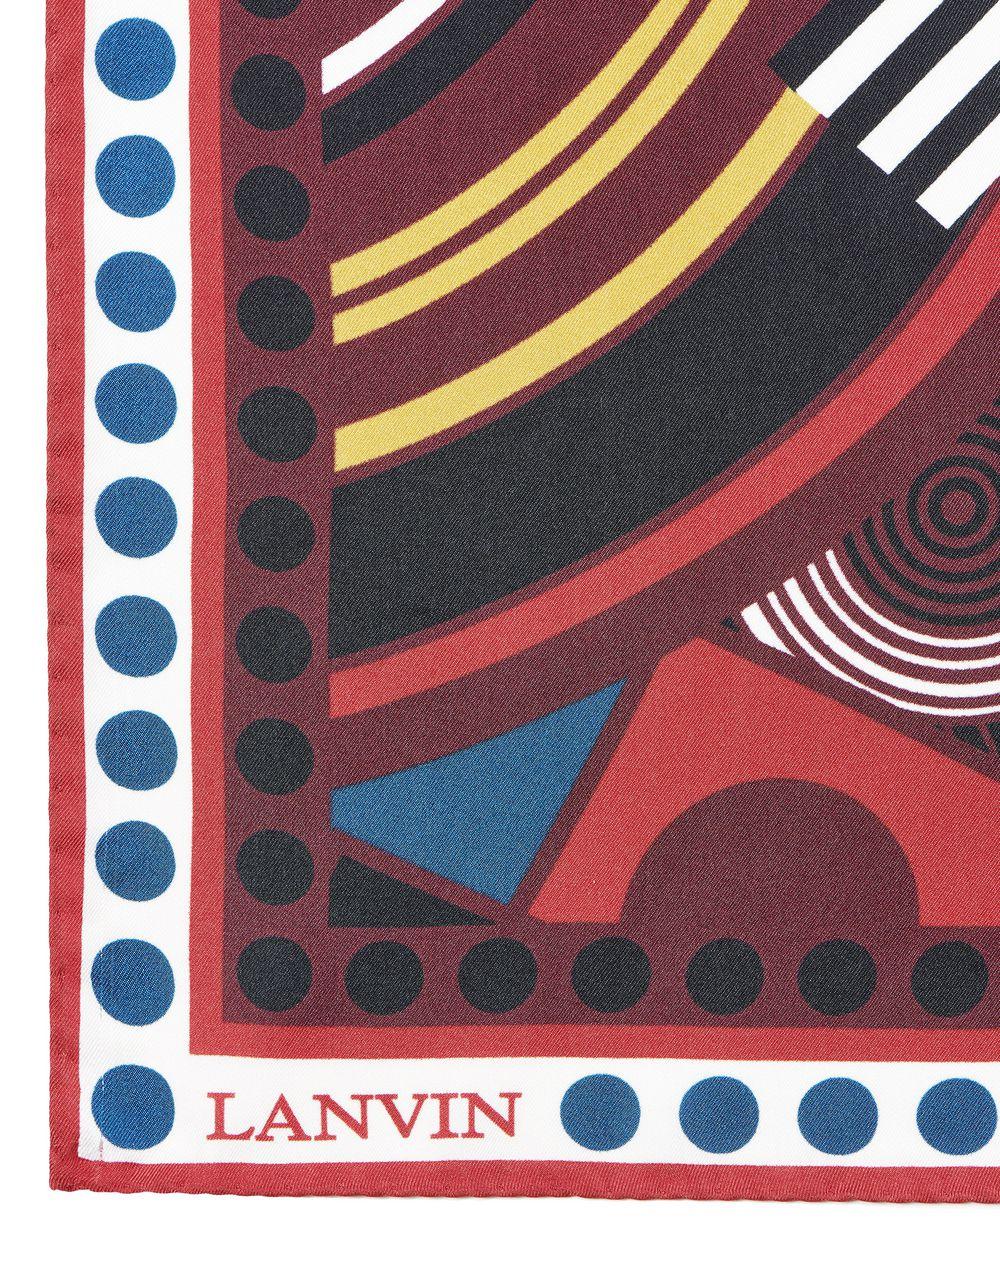 LARGE BLACK SQUARE SCARF WITH JACQUARD PRINT - Lanvin